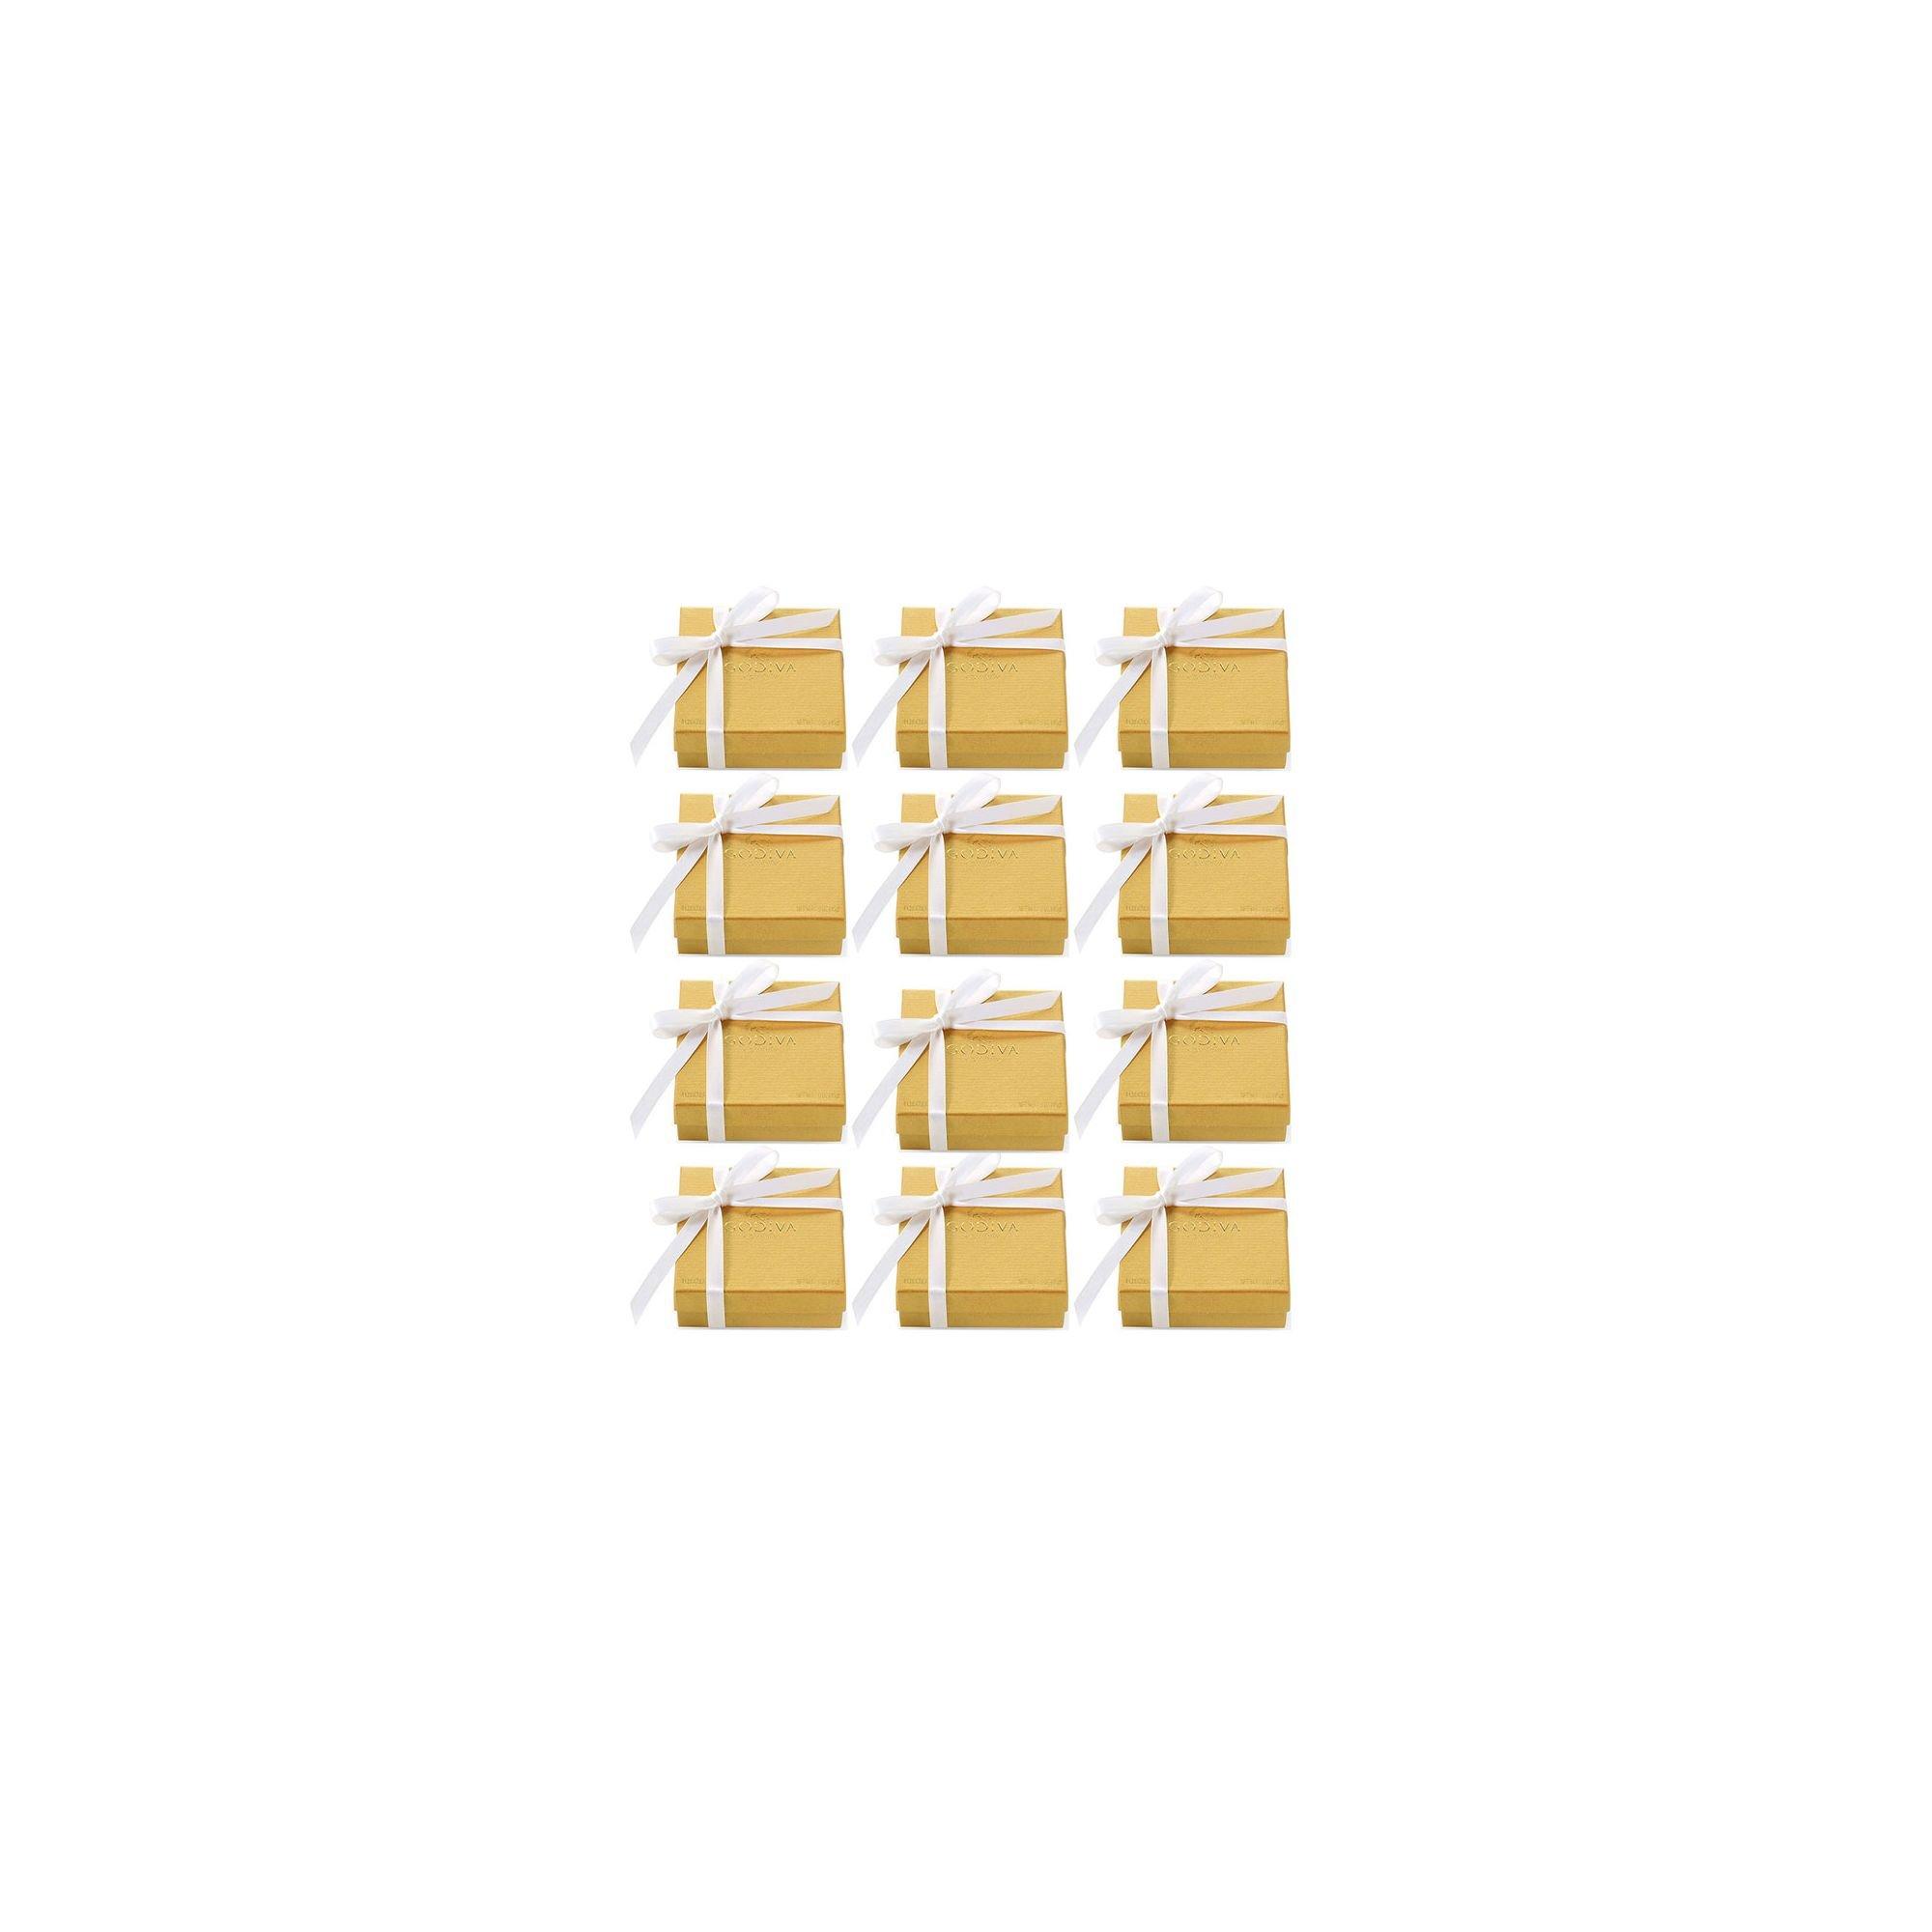 Godiva Chocolatier Assorted Chocolate Gold Favor Box, White Ribbon, Chocolate Wedding Favors, Birthday Favors, Set of 12 by GODIVA Chocolatier (Image #1)